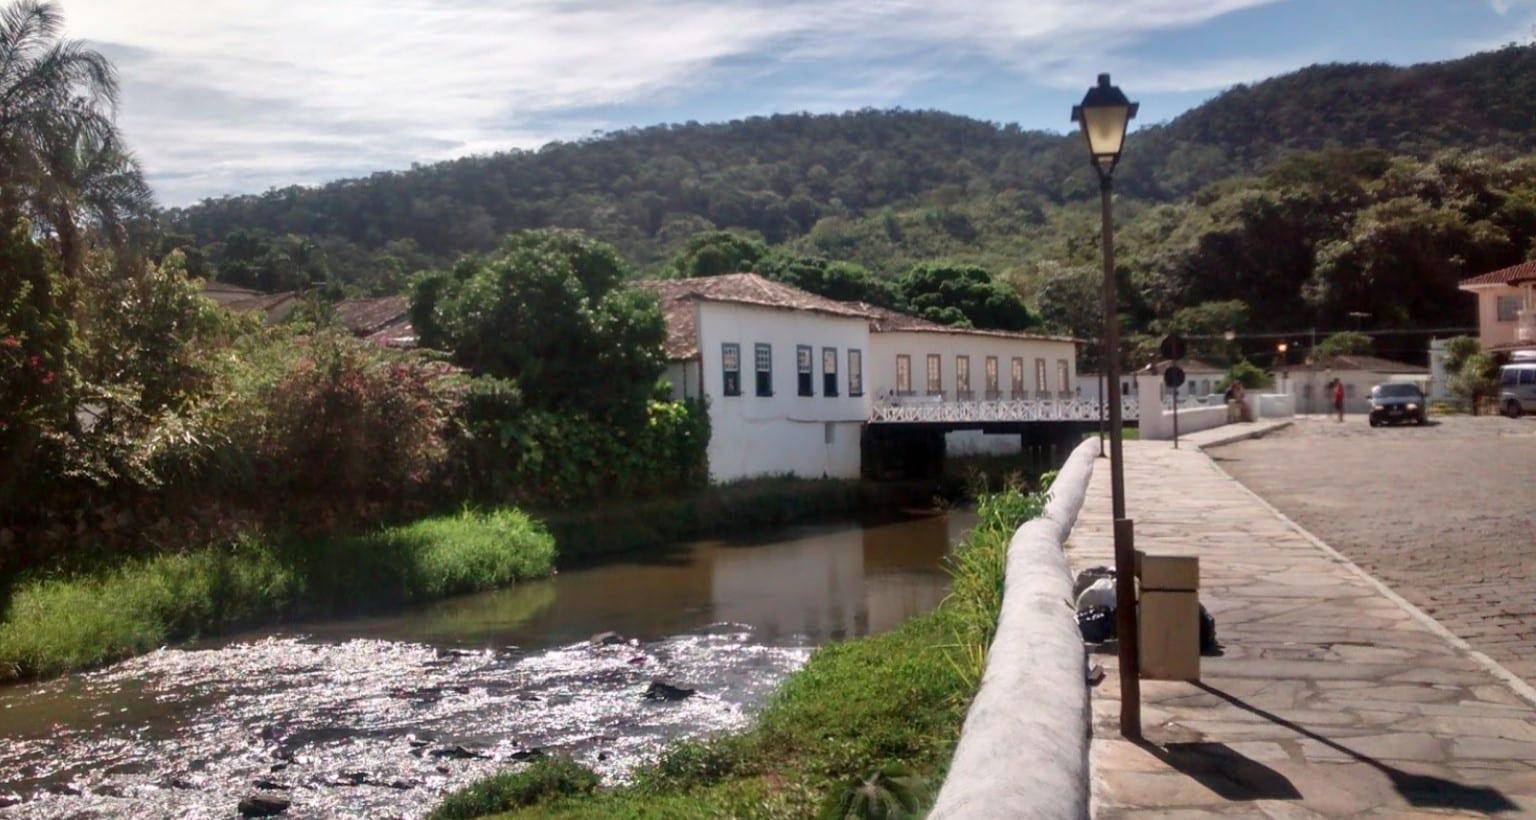 Acampamento no interior de Goiás: conheça destinos incríveis para acampar